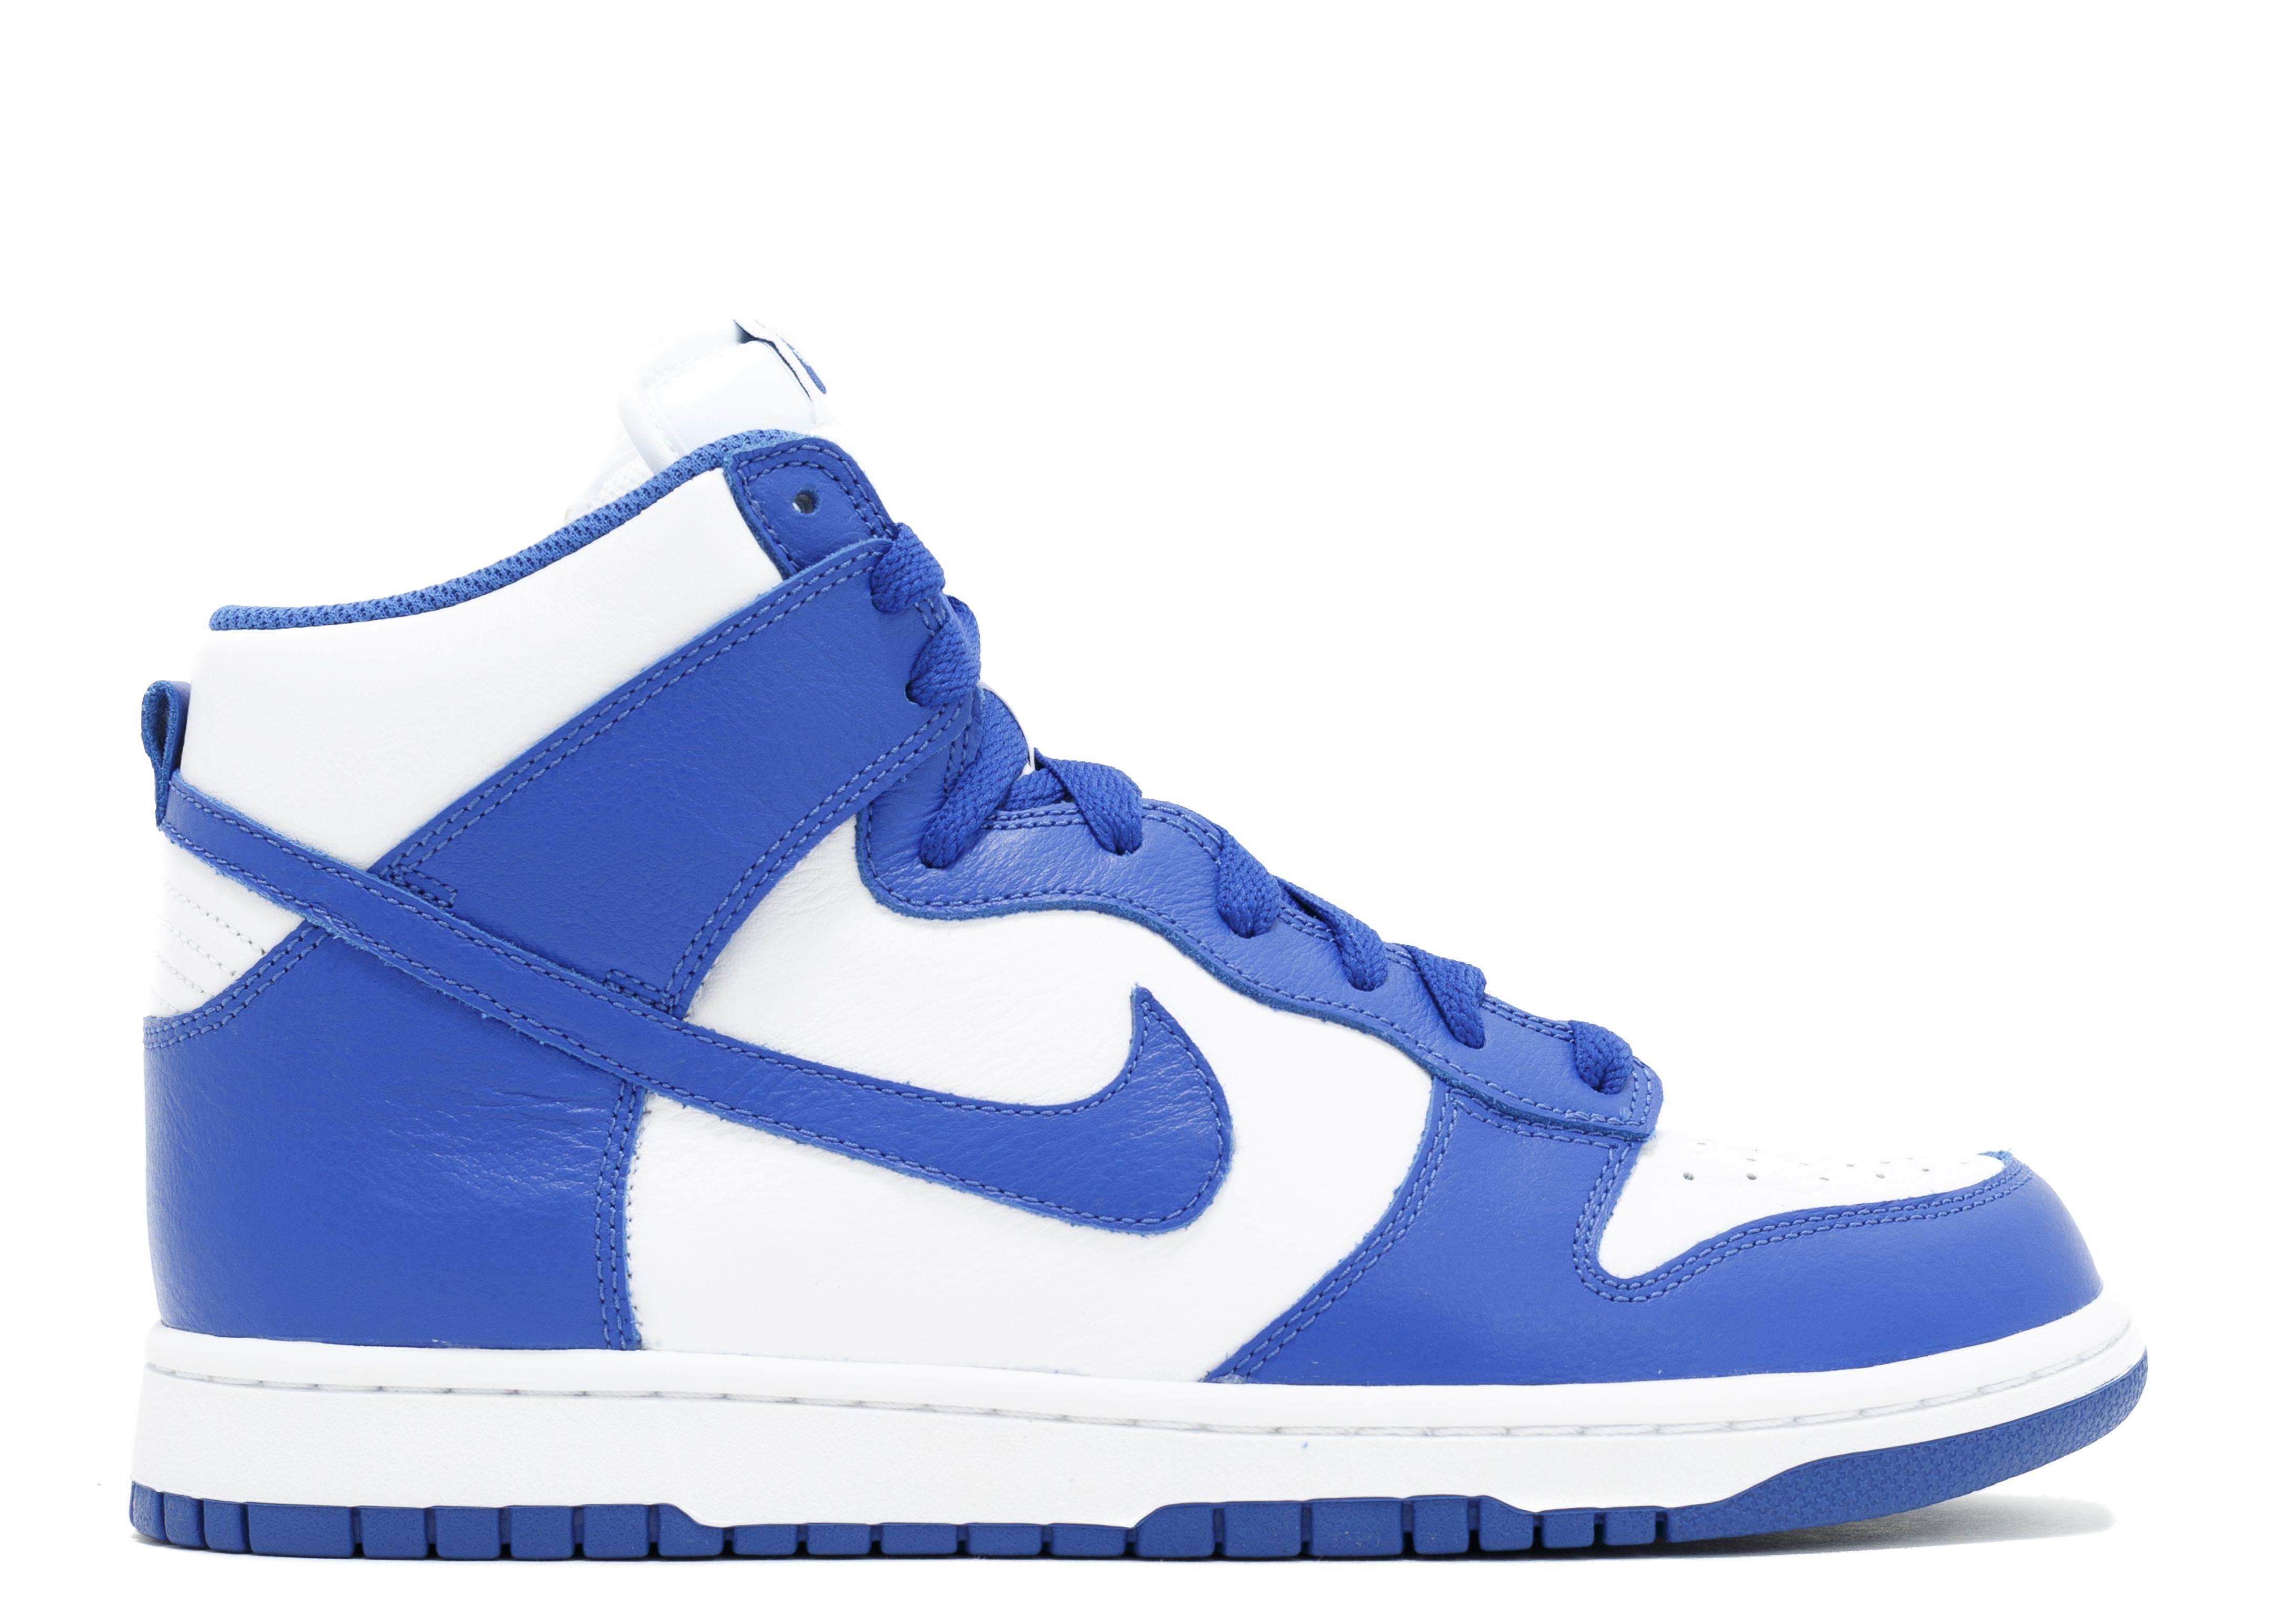 Dunk Retro Qs Be True Kentucky Nike Nike Dunks Nike Air Force Sneaker